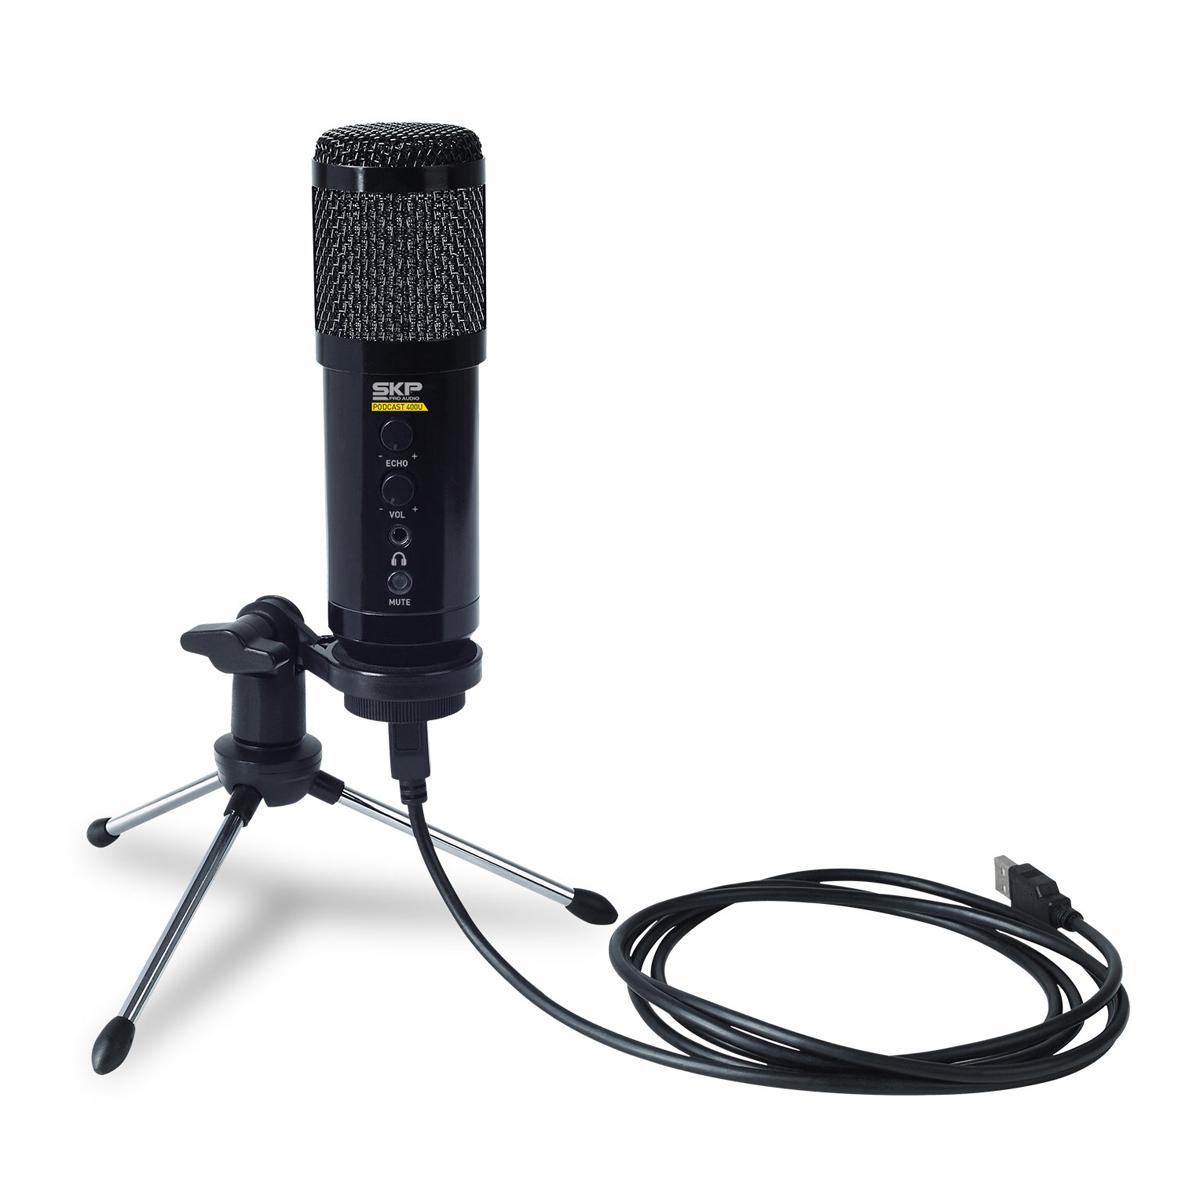 Kit Home Studio Microfone, Fone e Suporte SKP Superlux